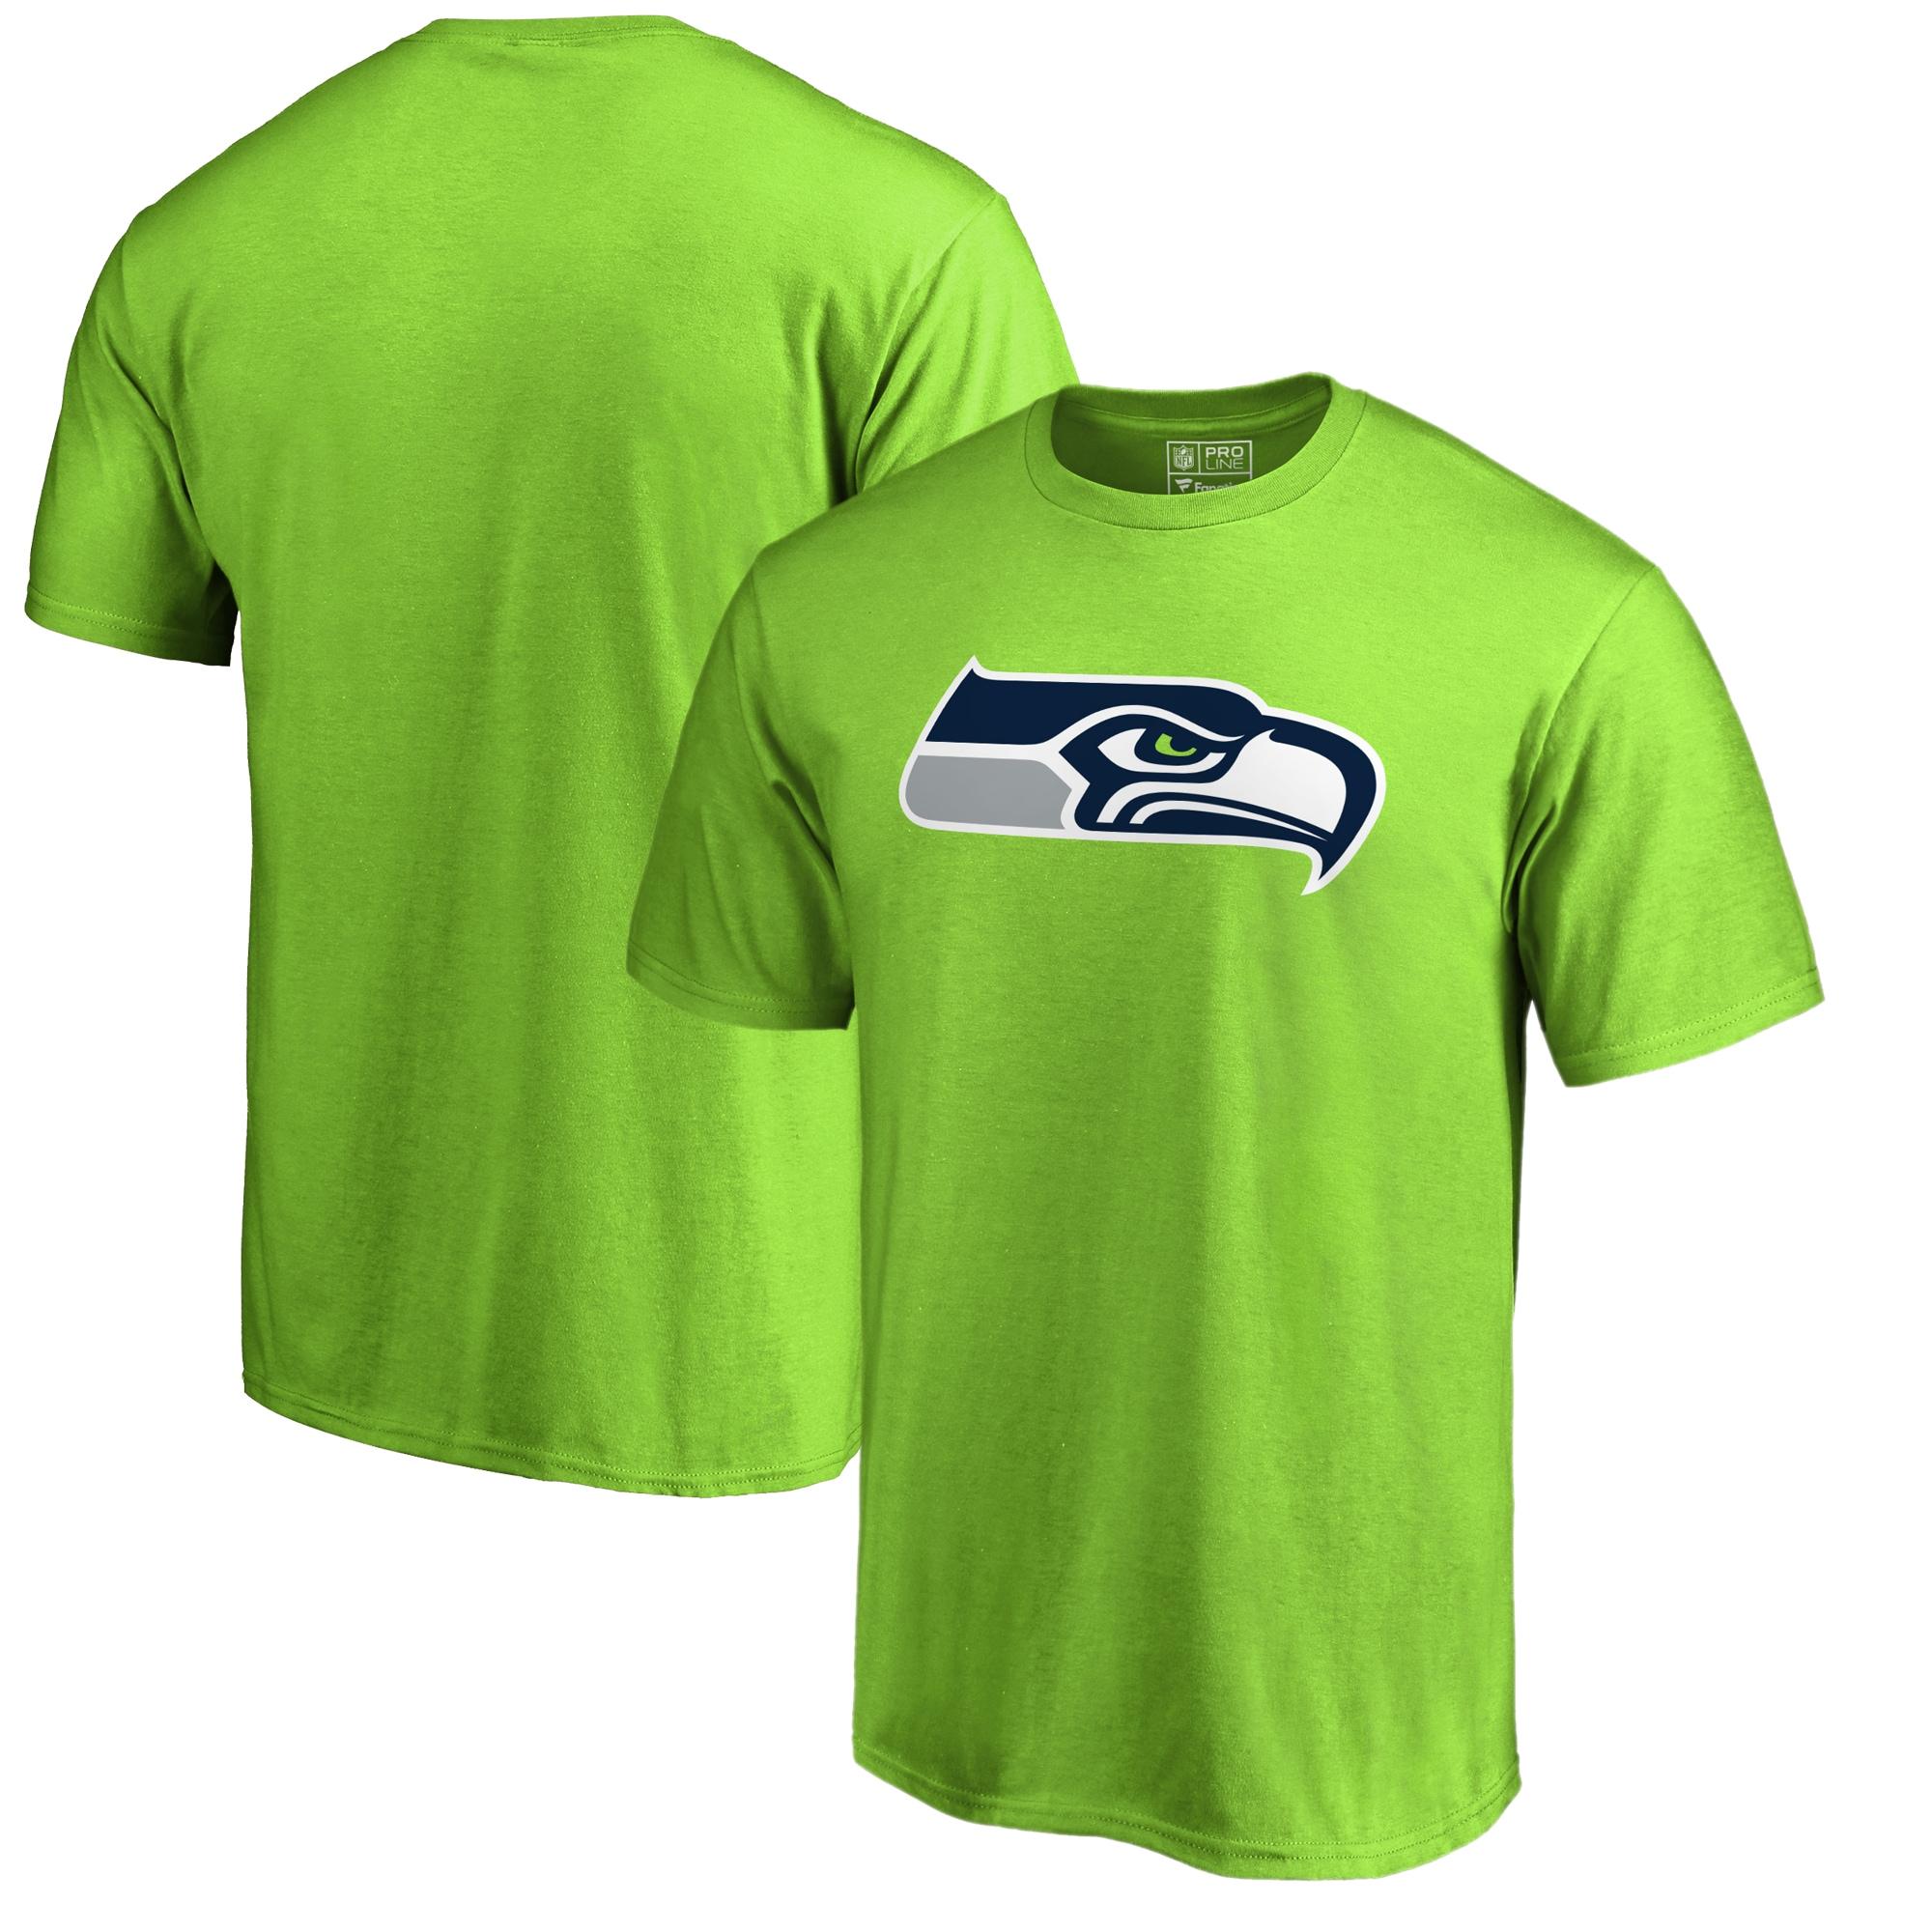 Seattle Seahawks NFL Pro Line by Fanatics Branded Primary Logo T-Shirt - Neon Green